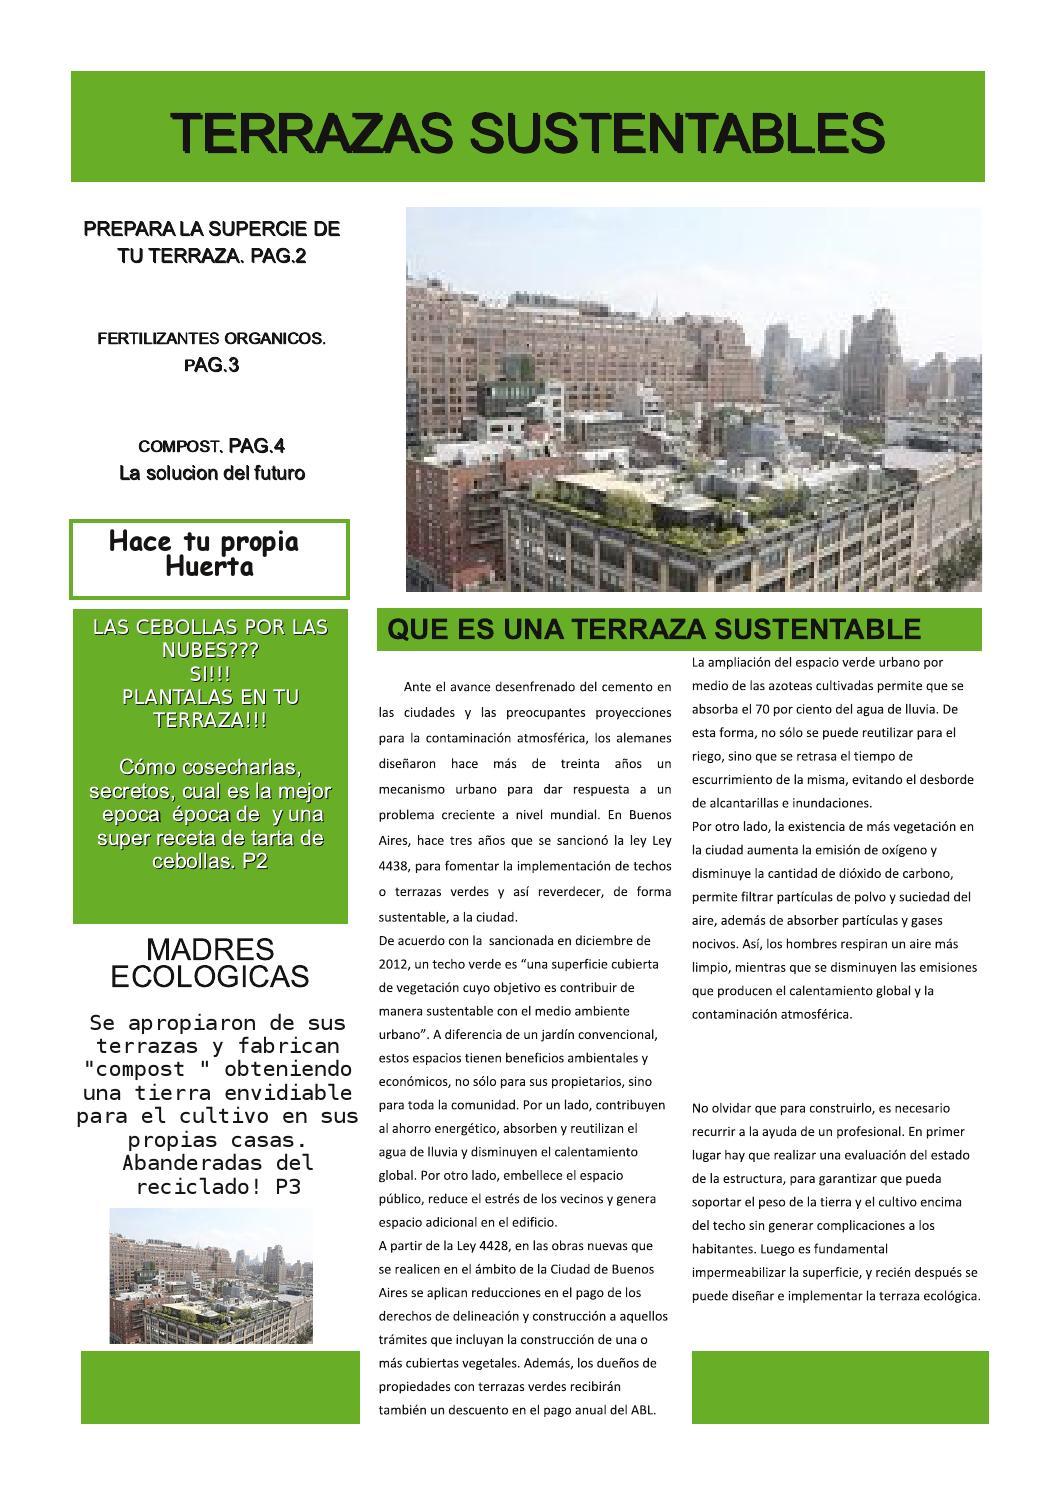 Terrazas Sustentables By Cristina Mudarra Issuu